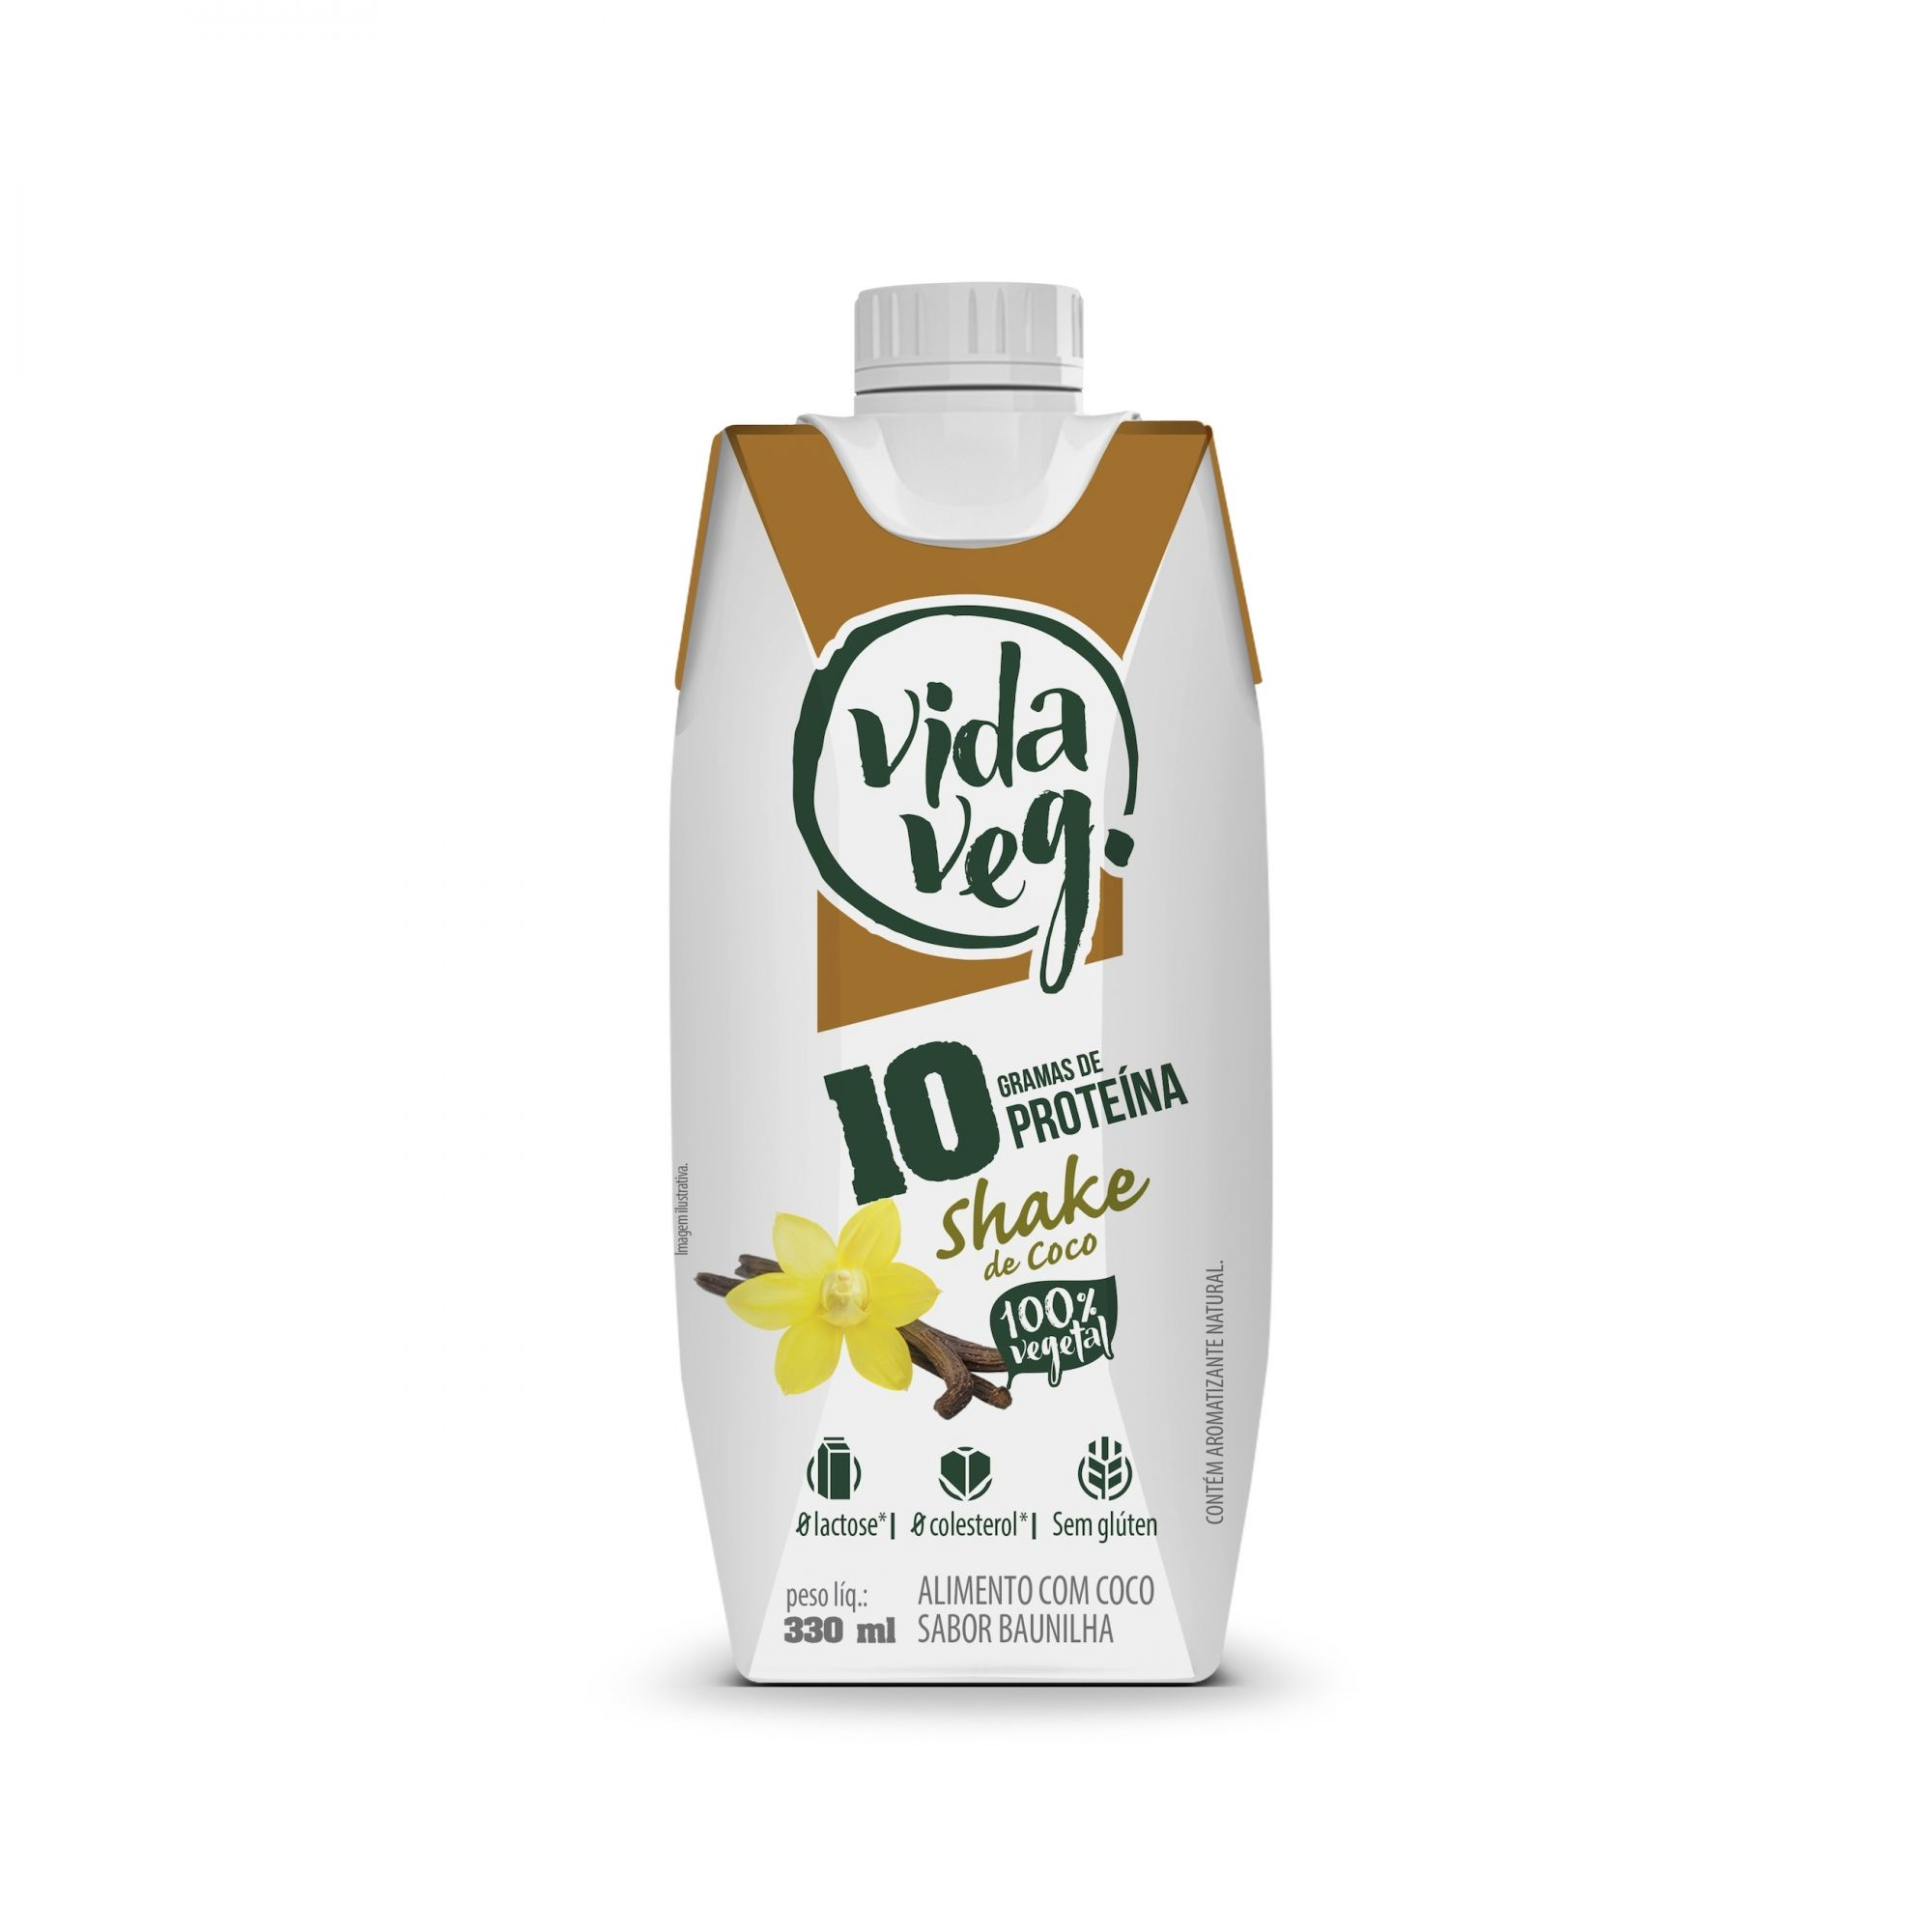 Shake vegano 10g de proteína, 330ml  - Vida Veg